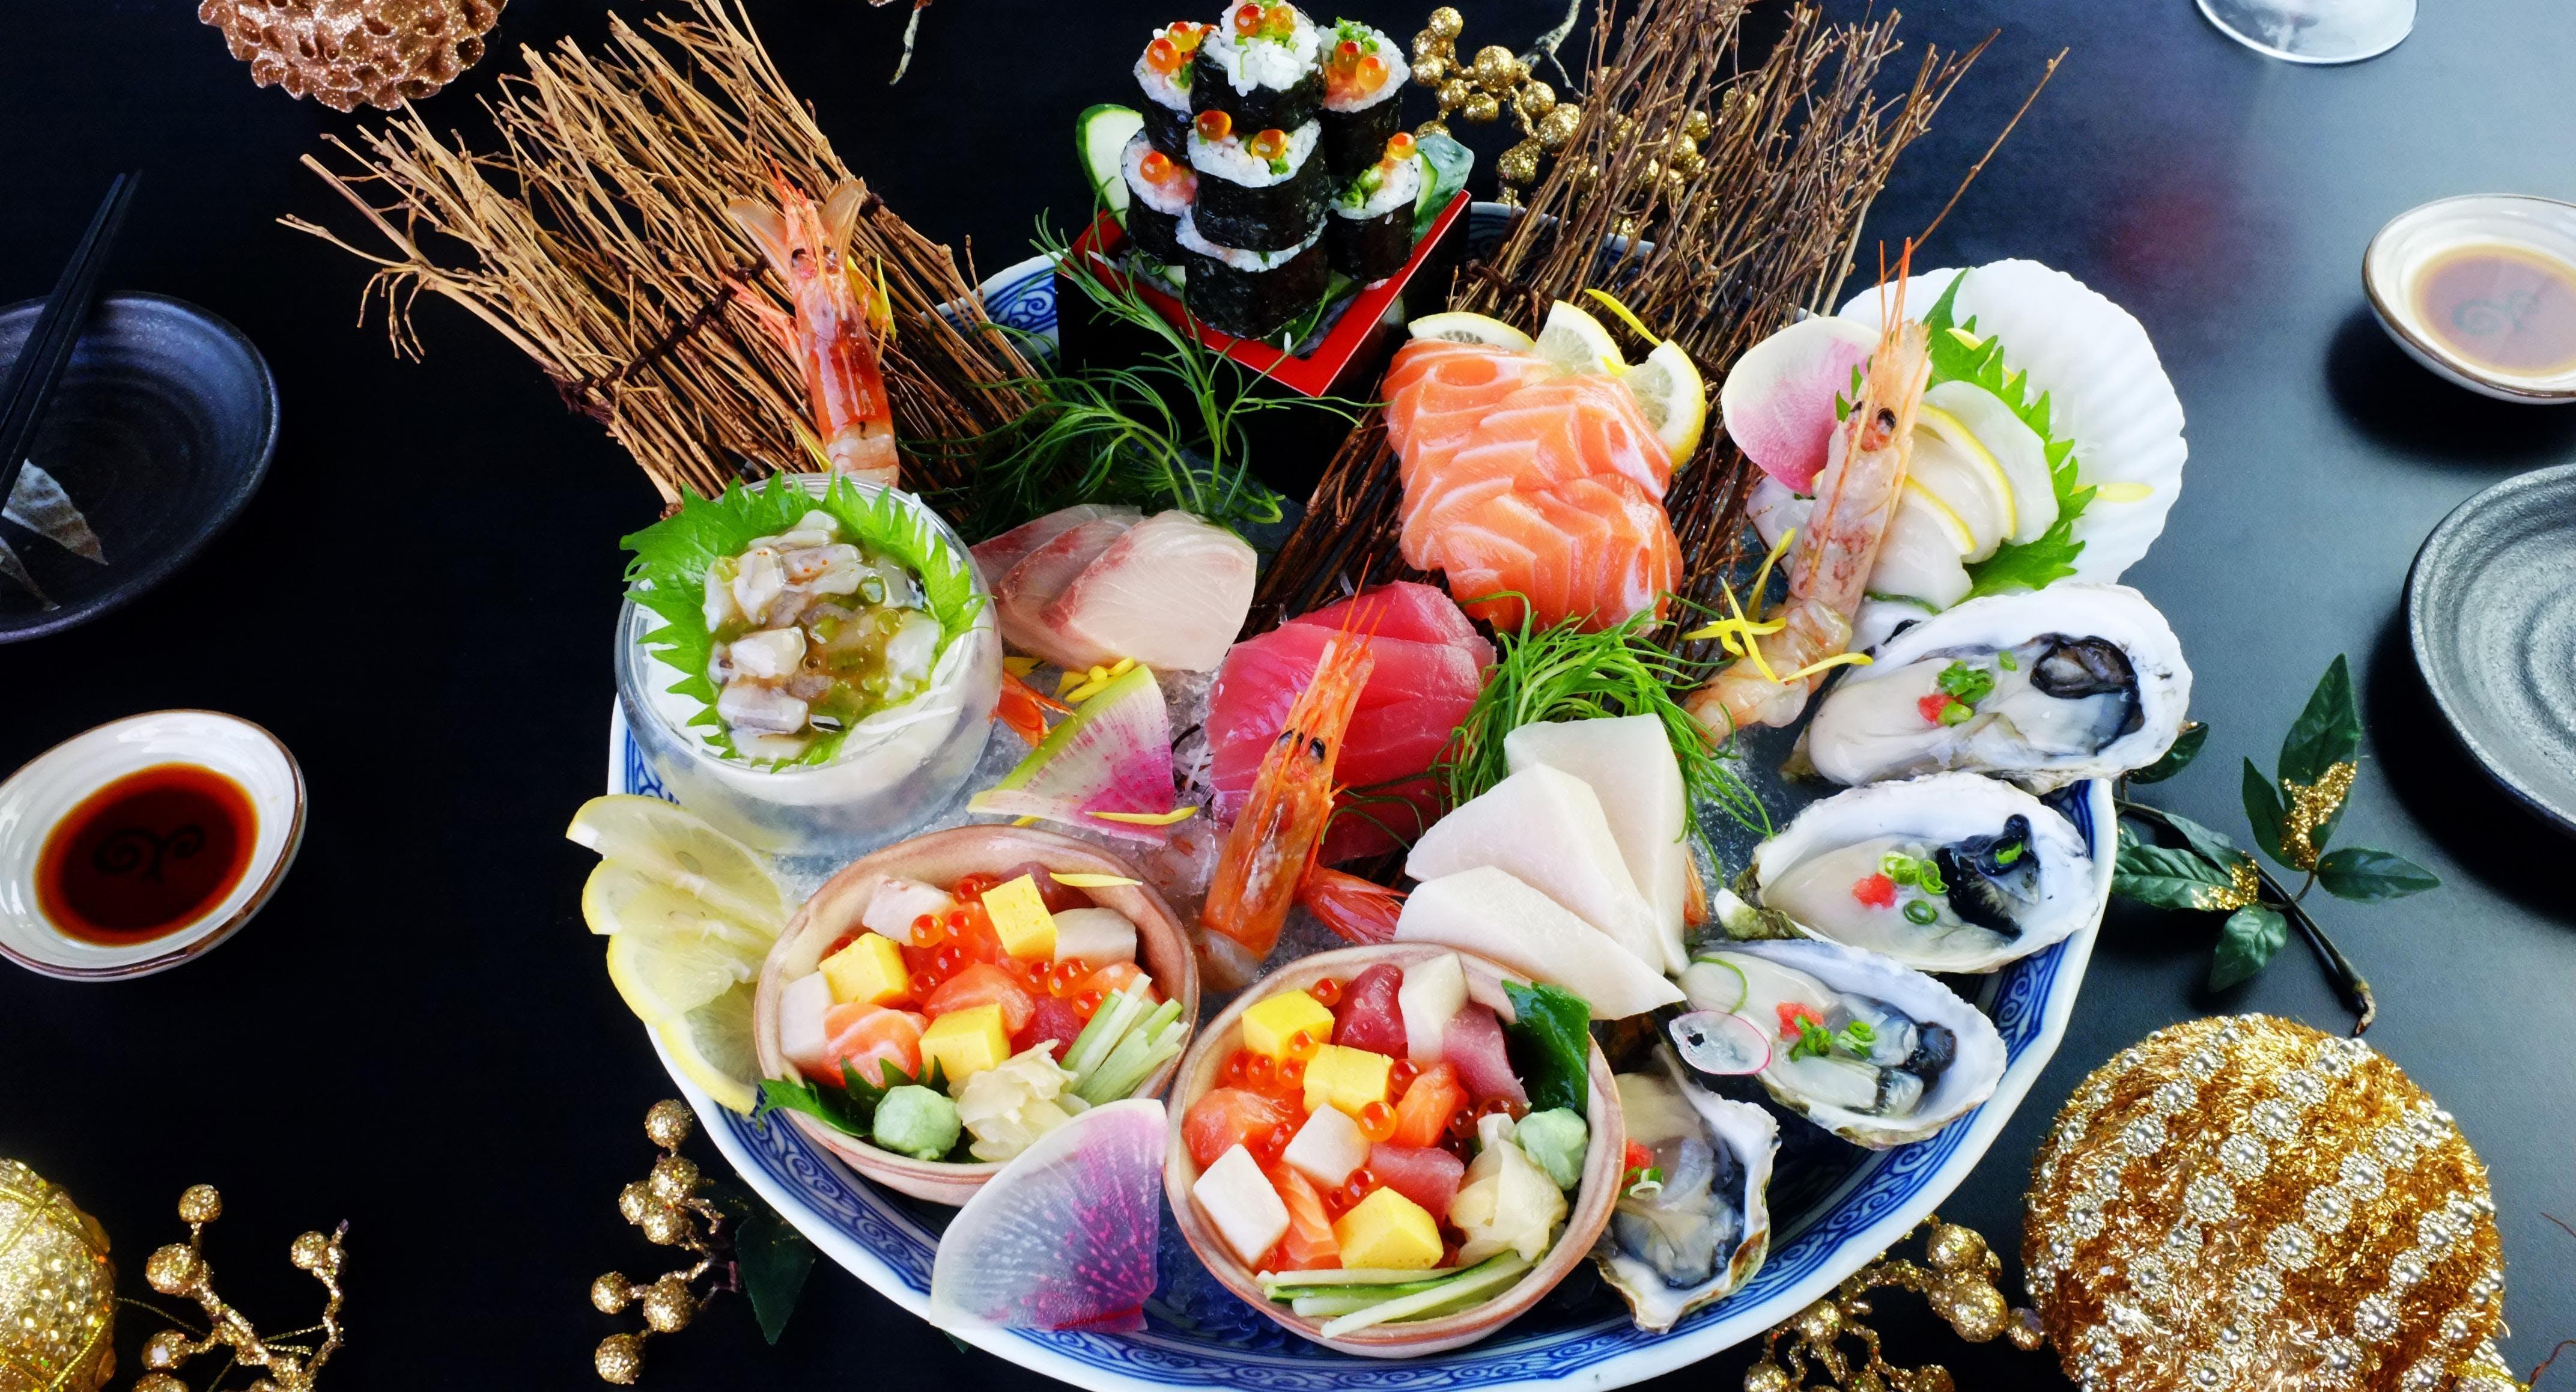 Tsukiji Fish Market Restaurant Singapore image 1